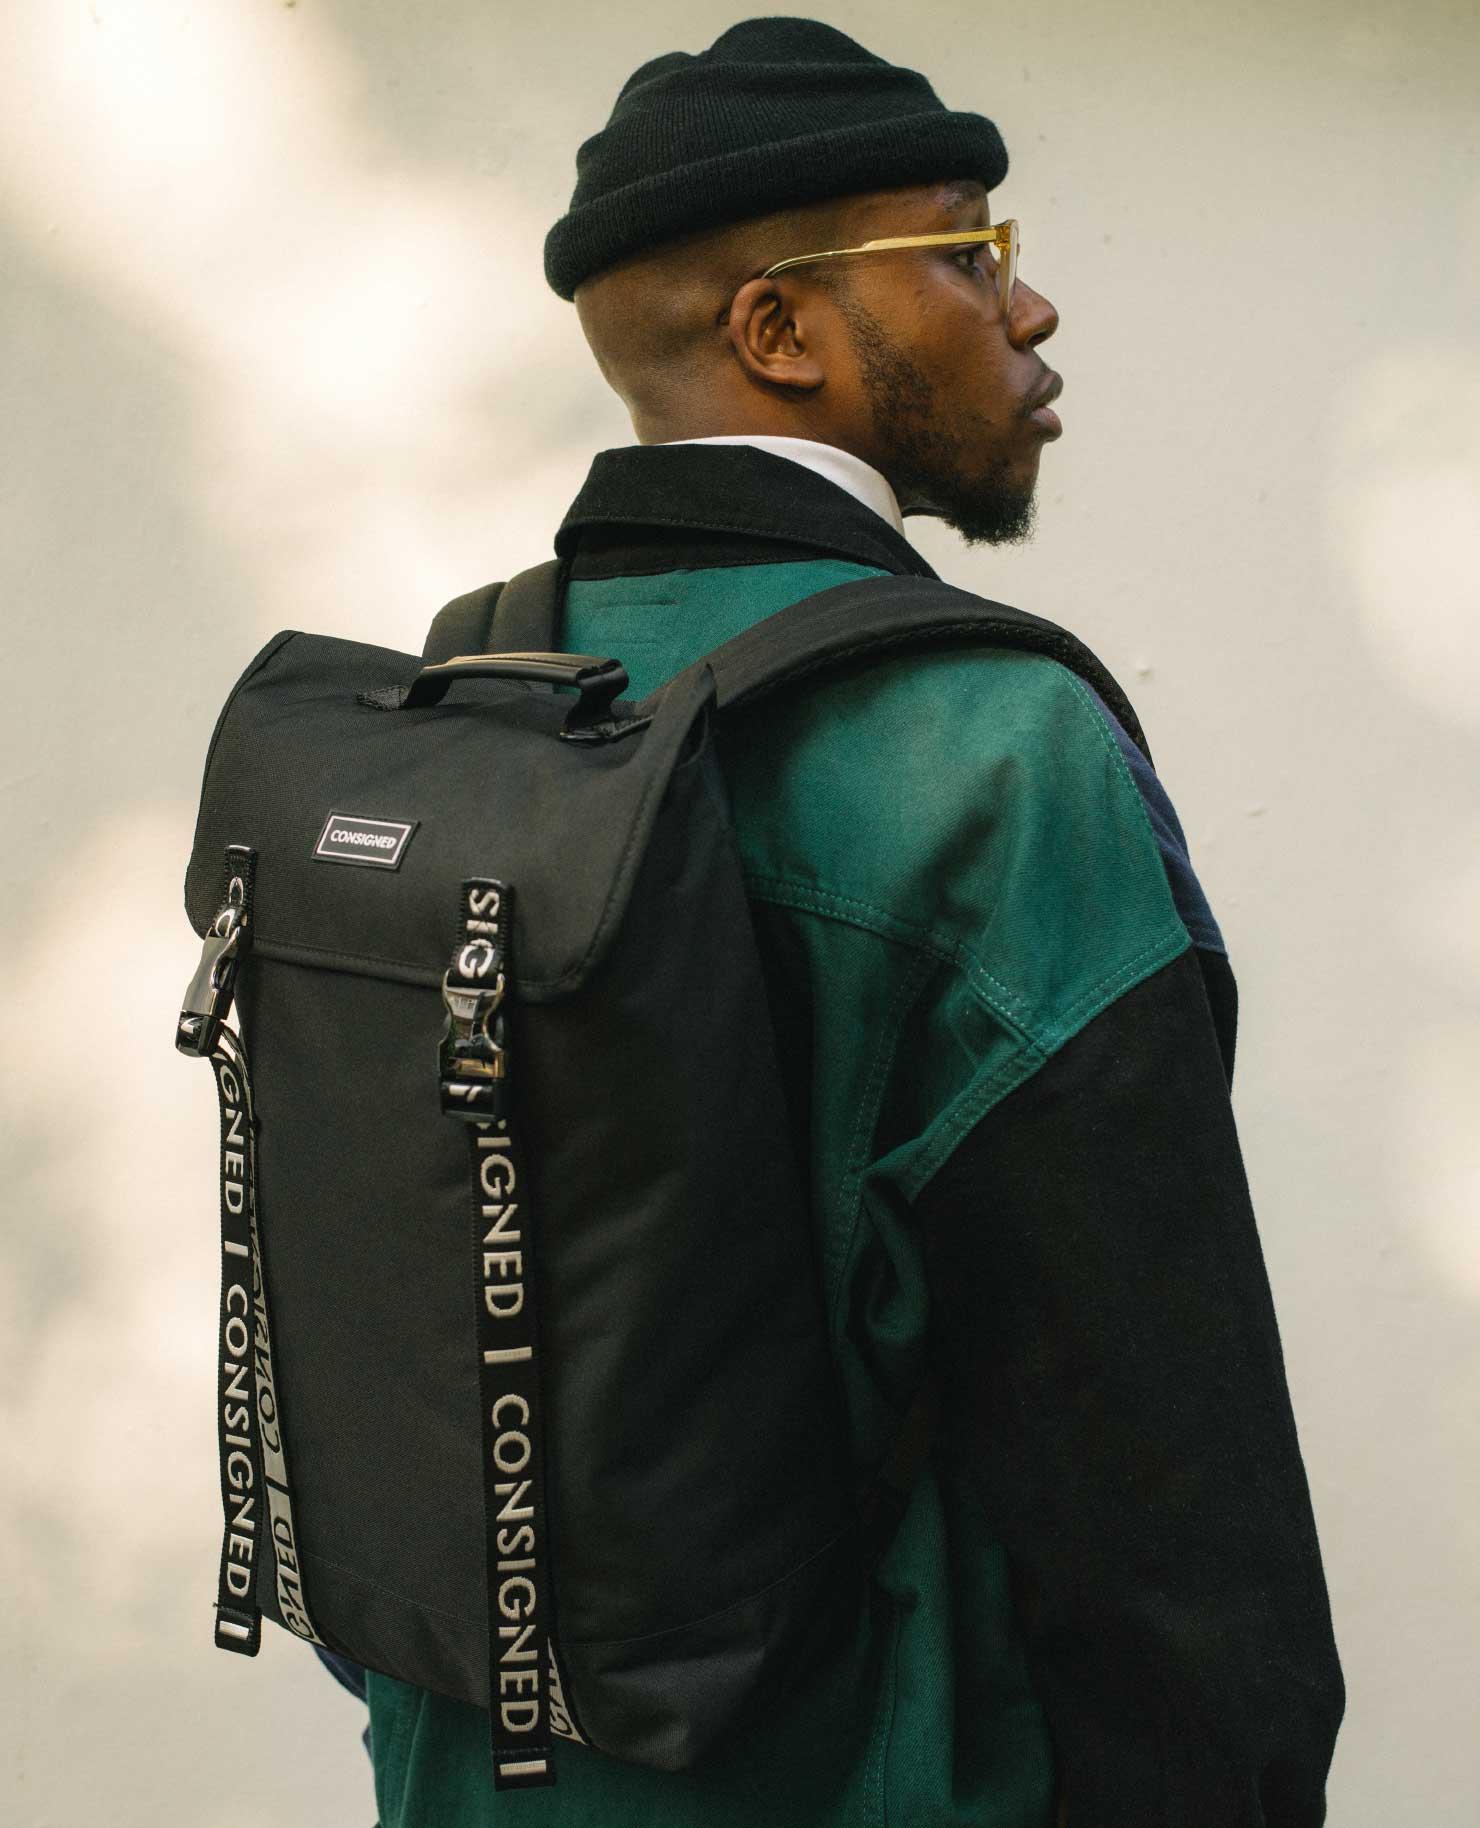 Che Lingo modeling the Helt Zane Backpack